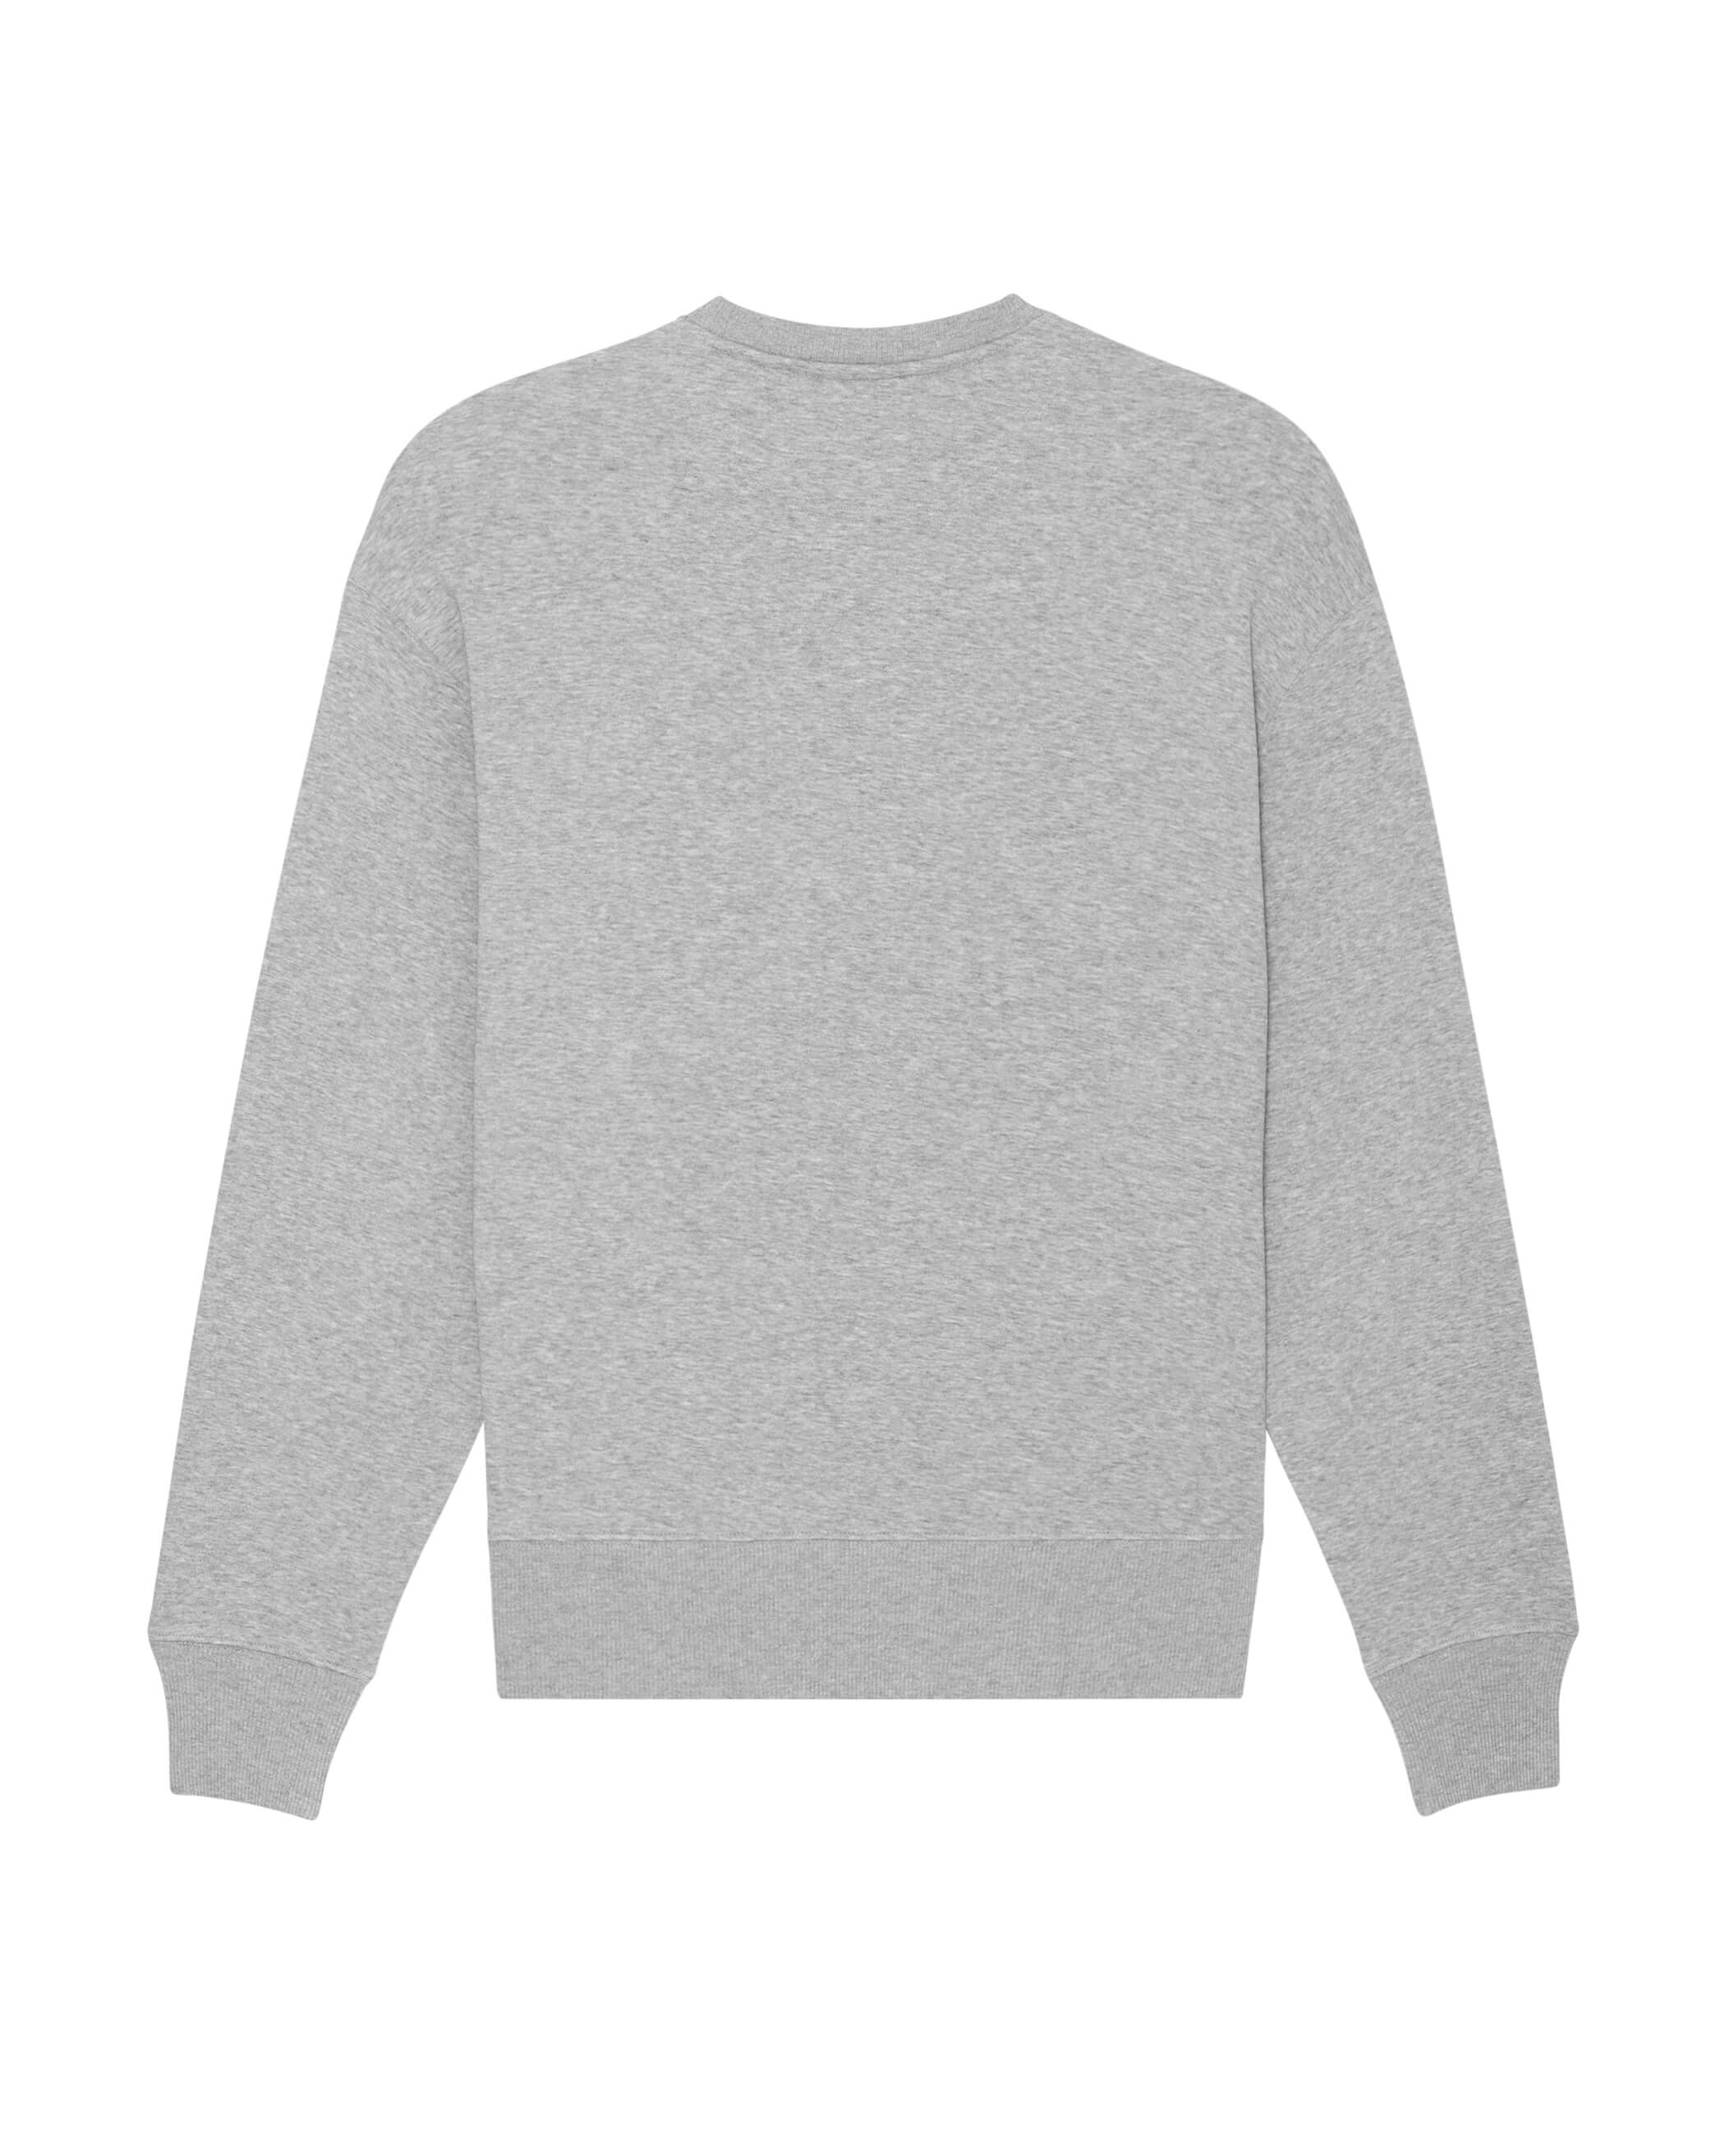 Goat Organic Apparel Bobby Oversized Sweater Grey